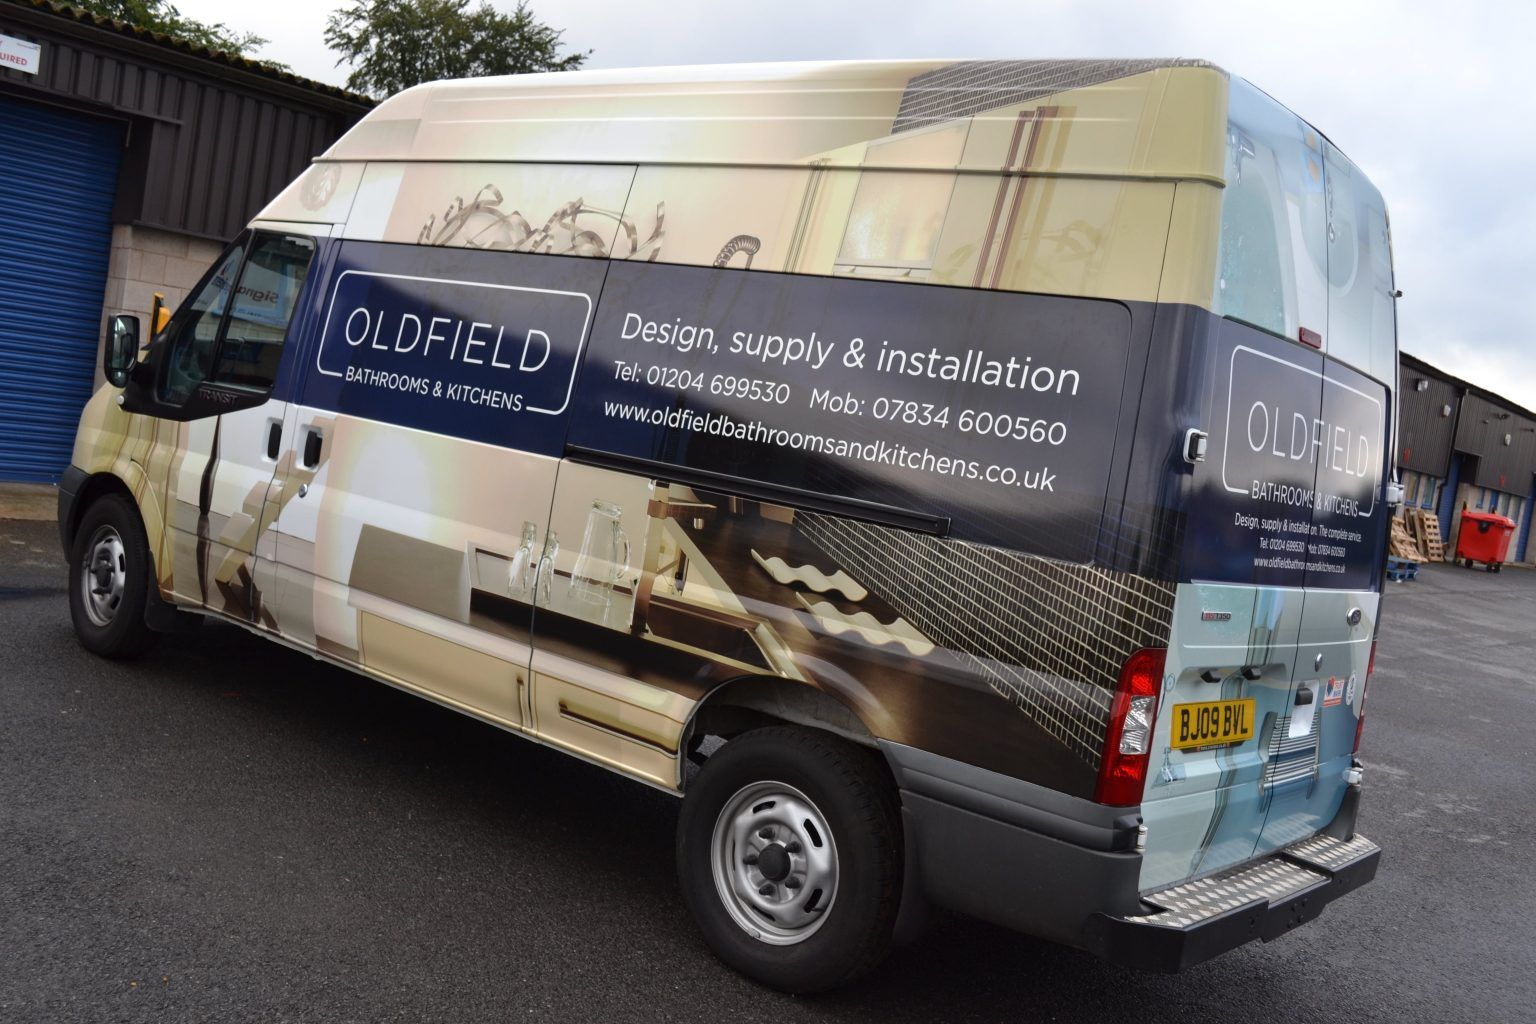 Oldfield Full Vehicle Wrap